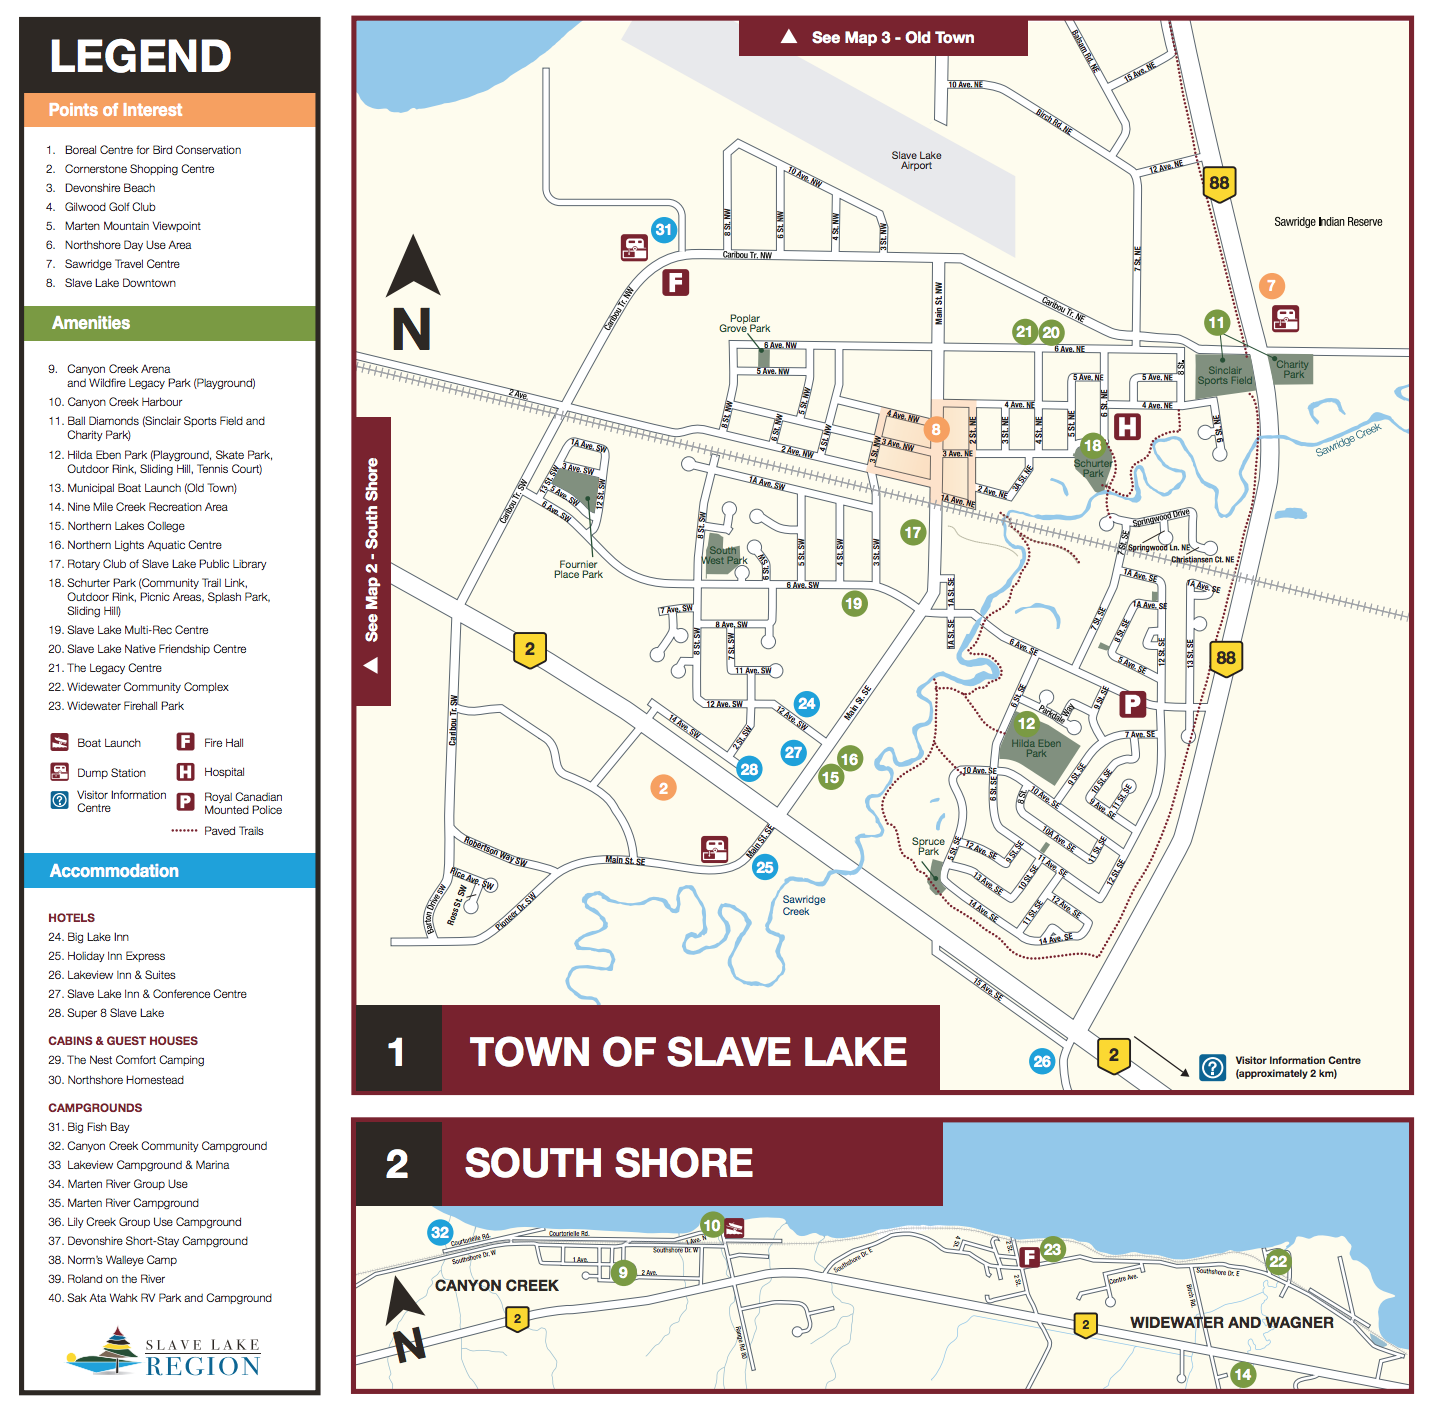 Avenircreative-Slave-Lake-Region-Map-1.png